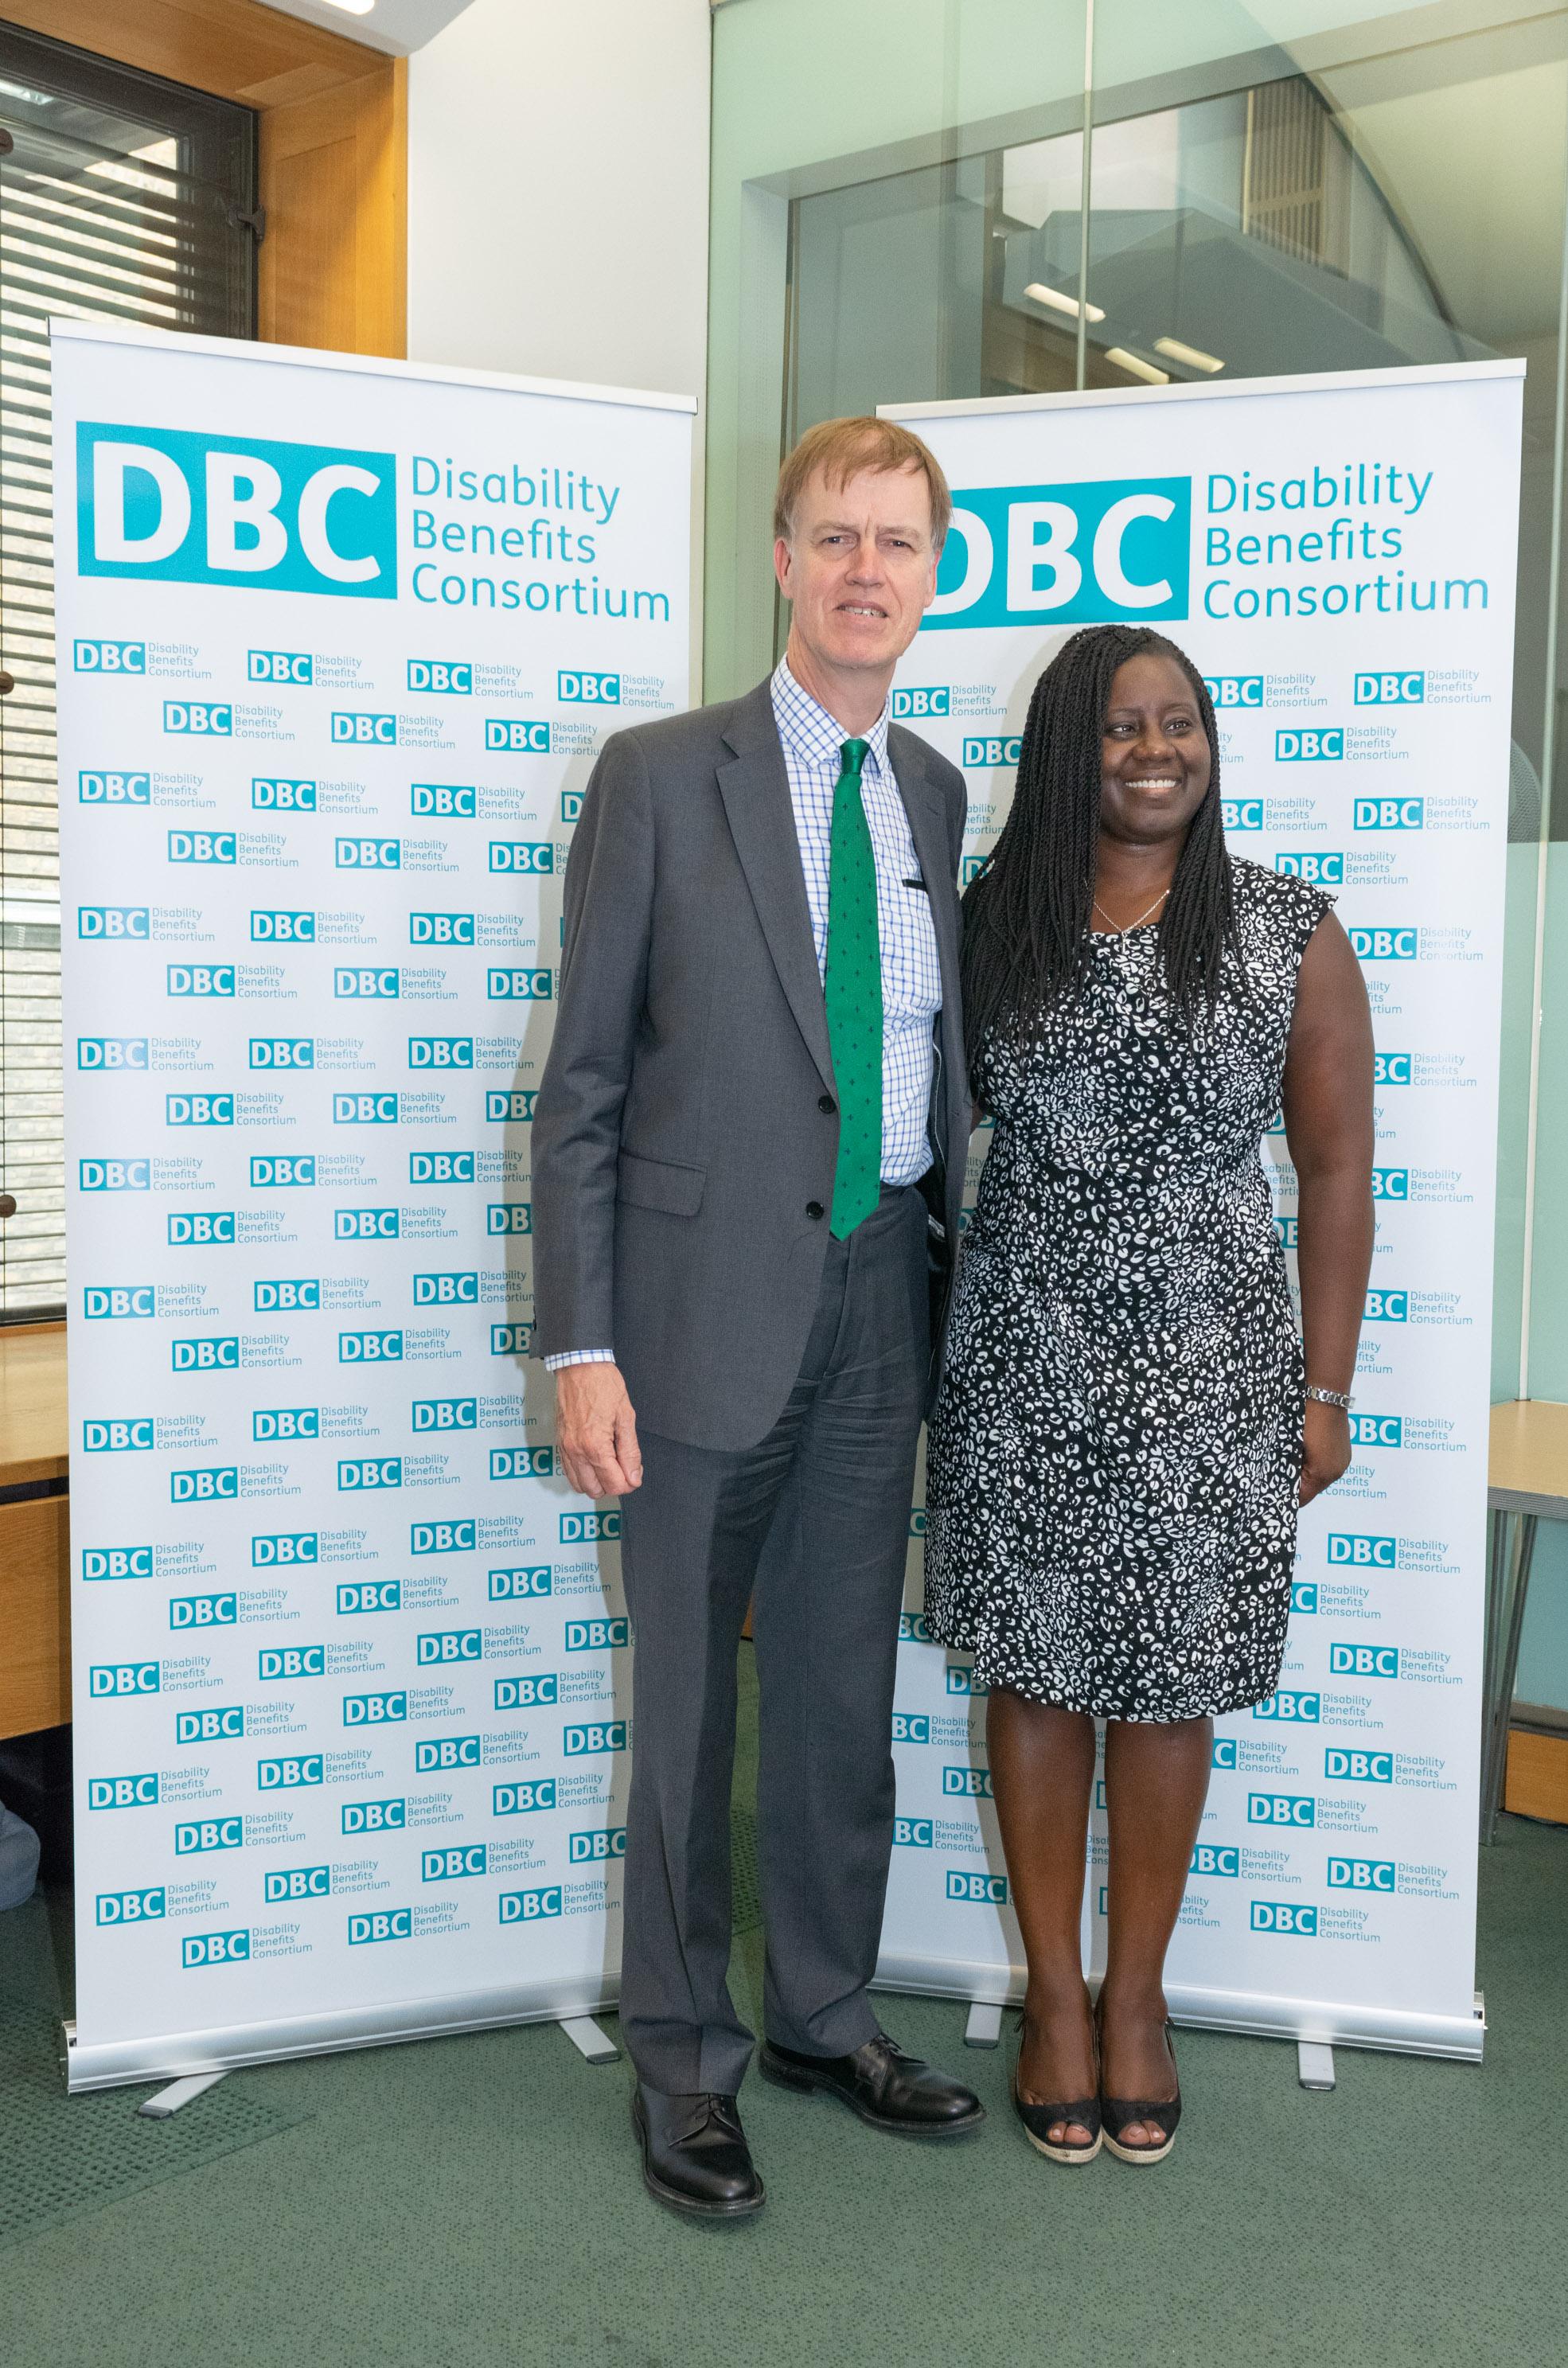 Stephen Timms MP and Marsha de Cordova MP (002).JPG